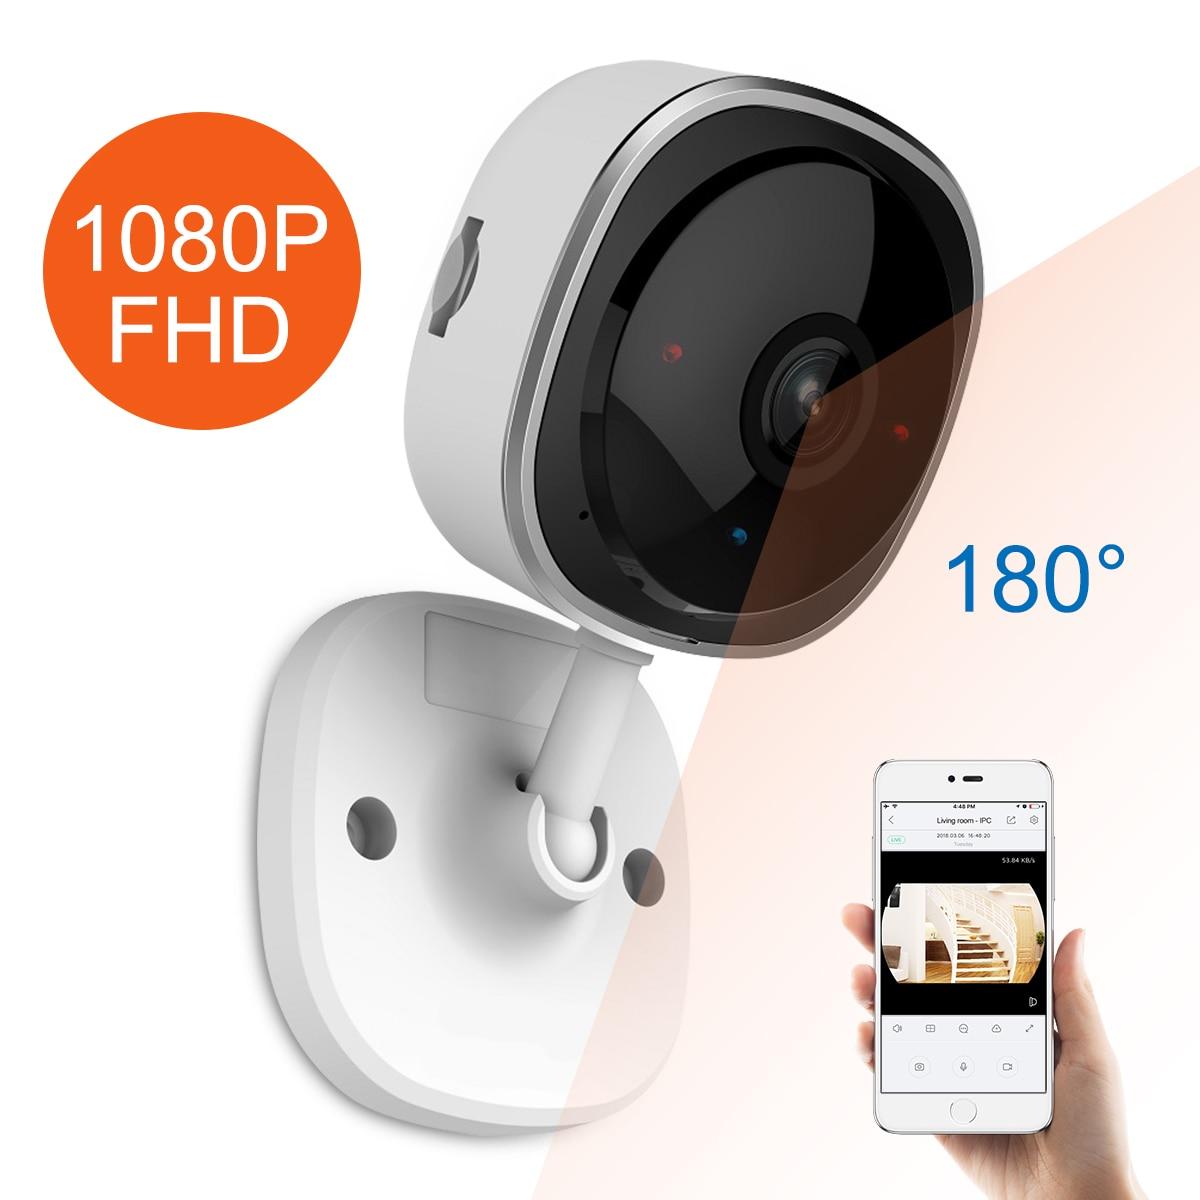 SANNCE HD 1080P Fisheye IP Camera Wireless Wifi Mini Network Camara Night Vision IR Cut Home Security Camara Wi-Fi Baby Monitor